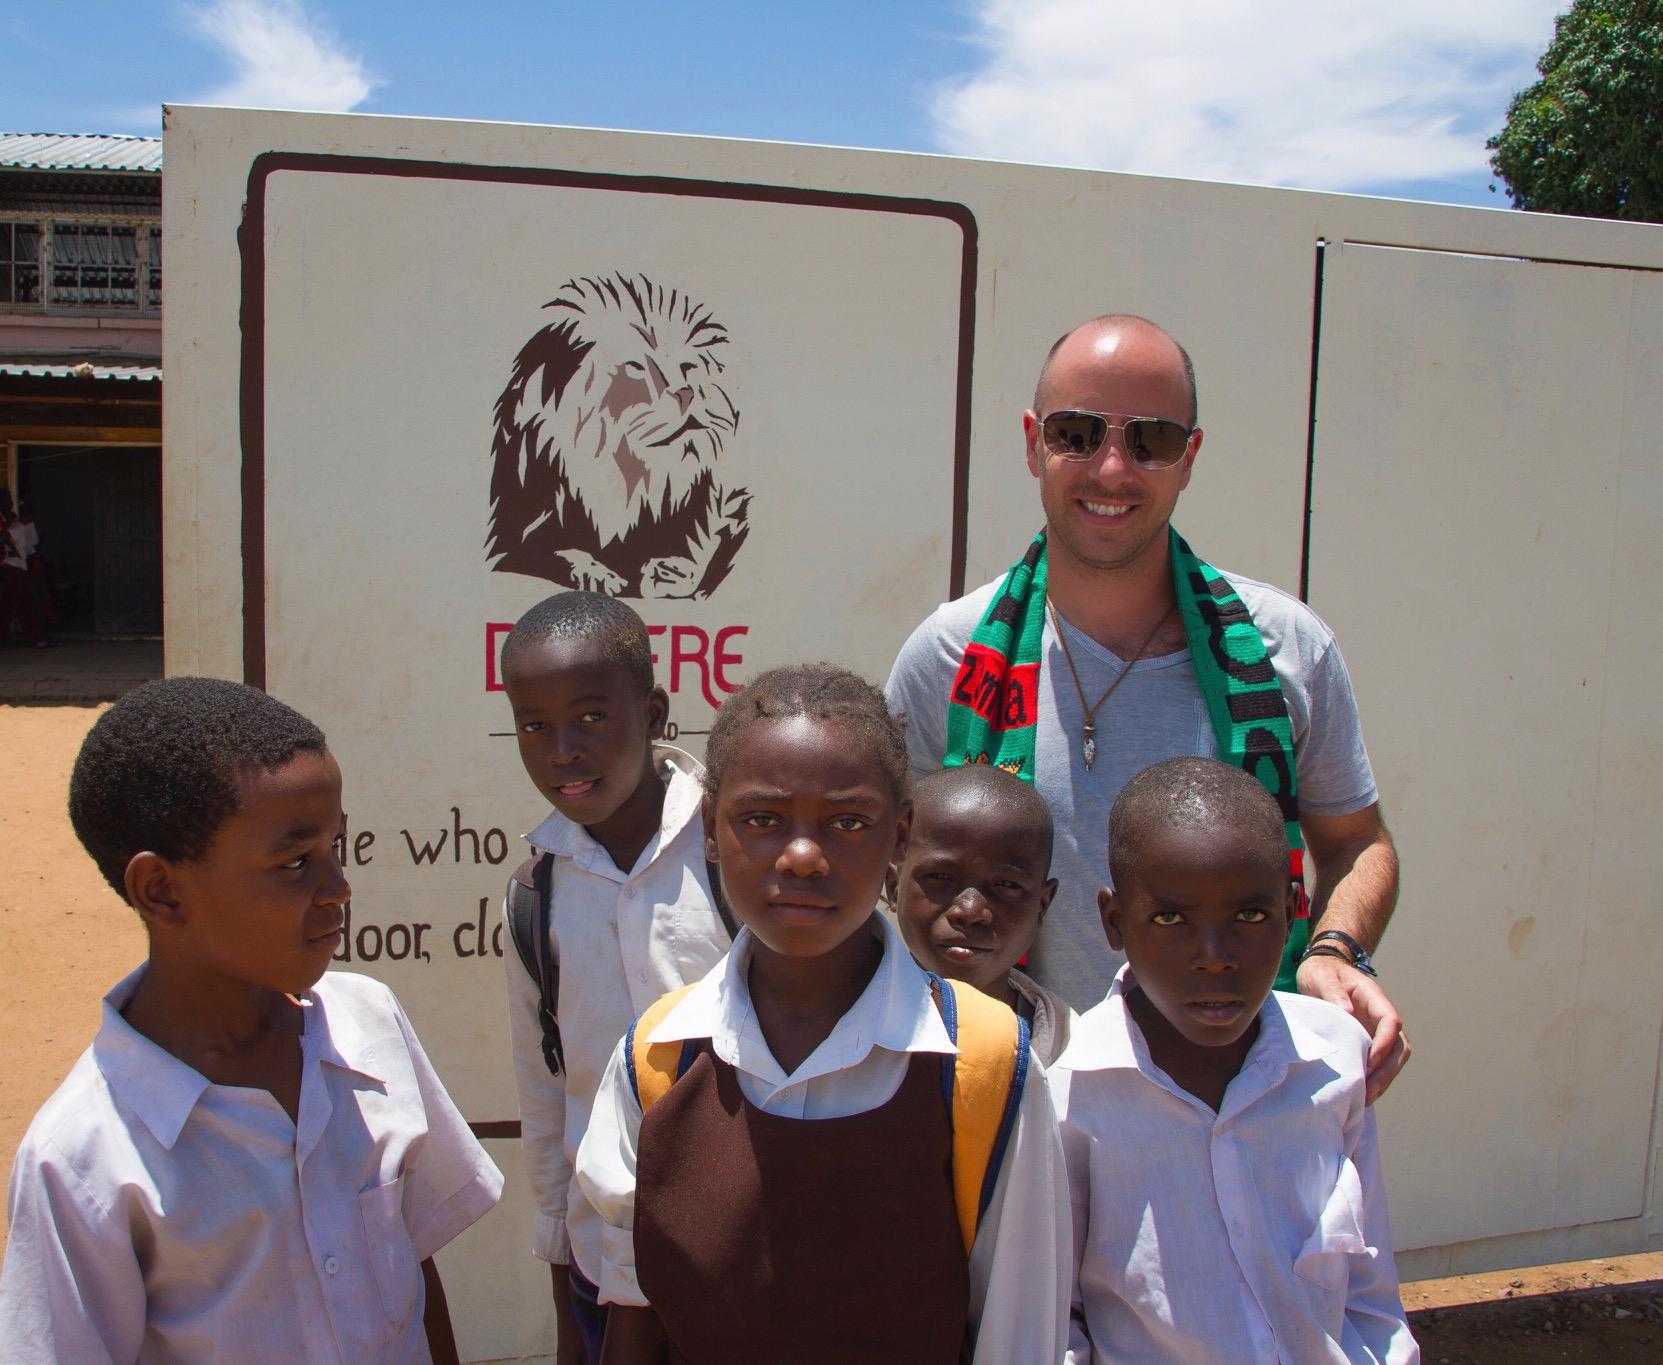 At Linda Community School, Zambia